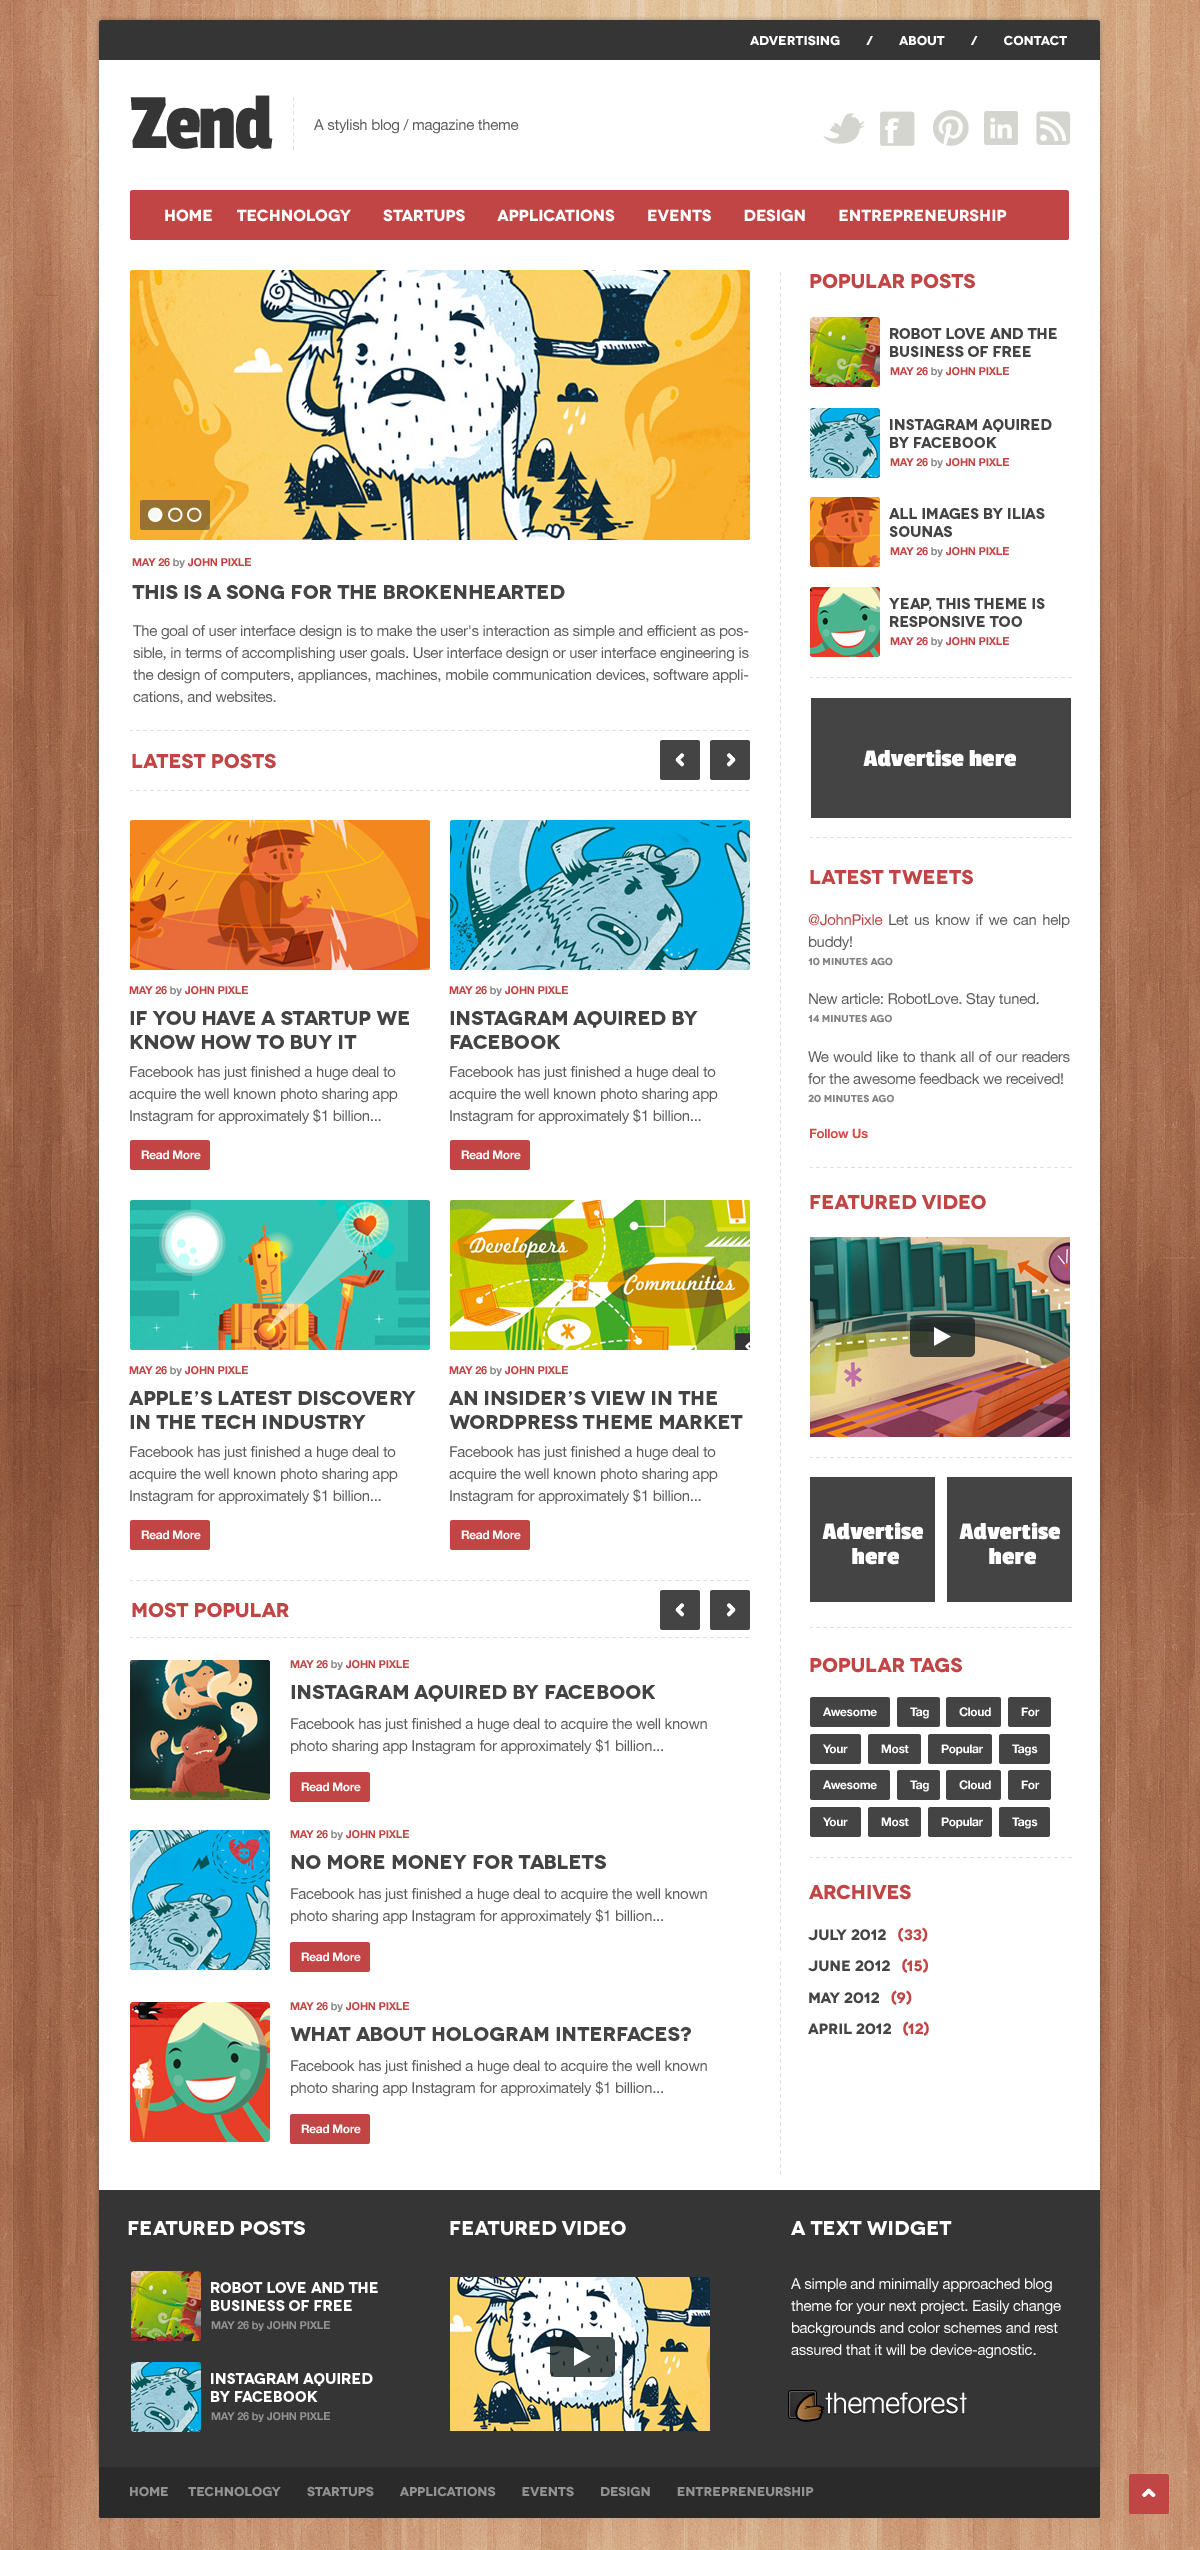 Zend - A stylish news/blog .psd theme